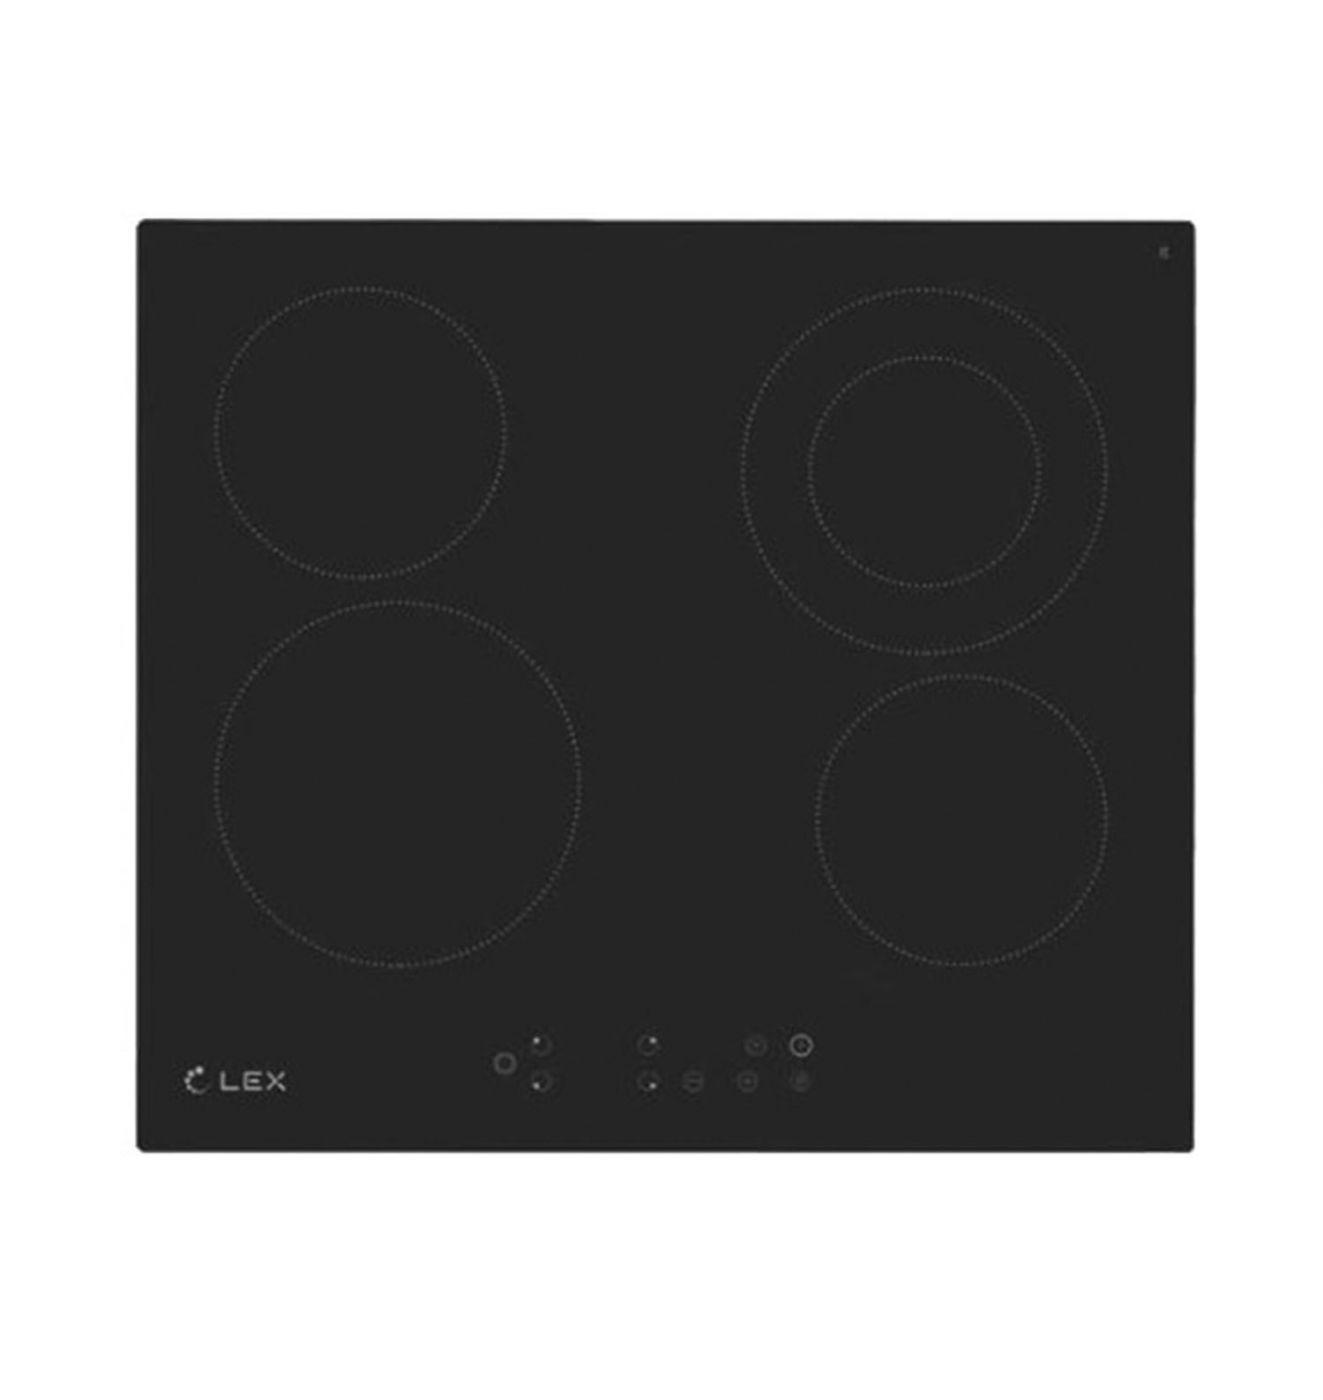 Электрическая варочная панель LEX EVH 641 BL (CHYO000184)